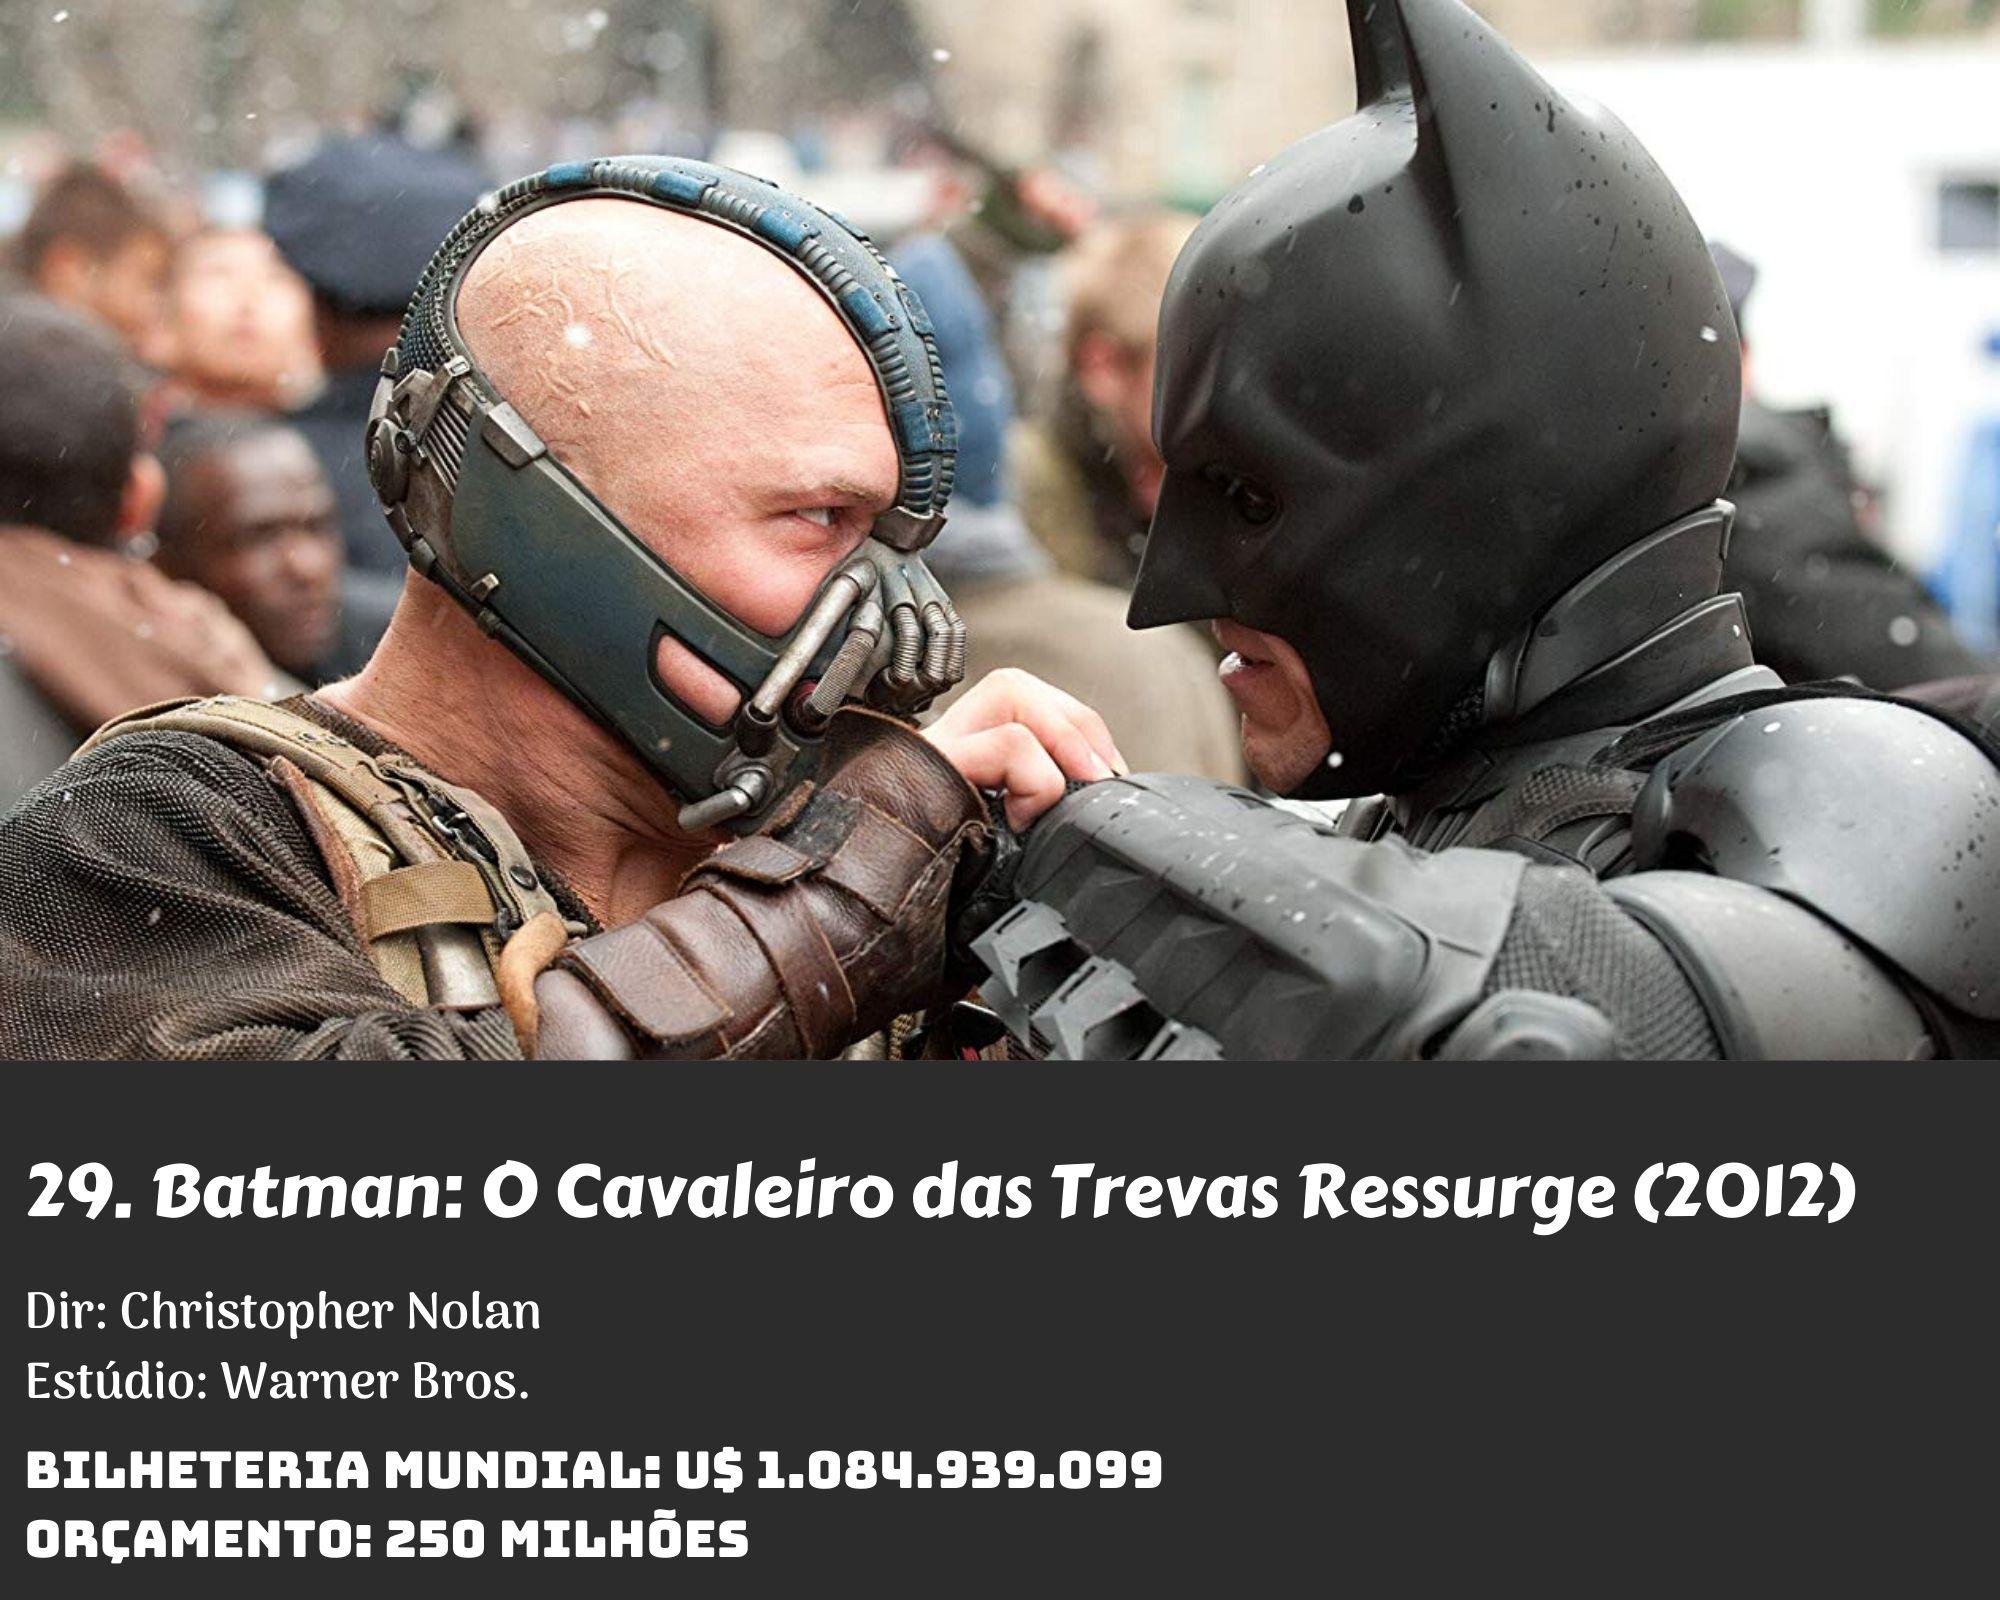 29. The Dark Knight Rises